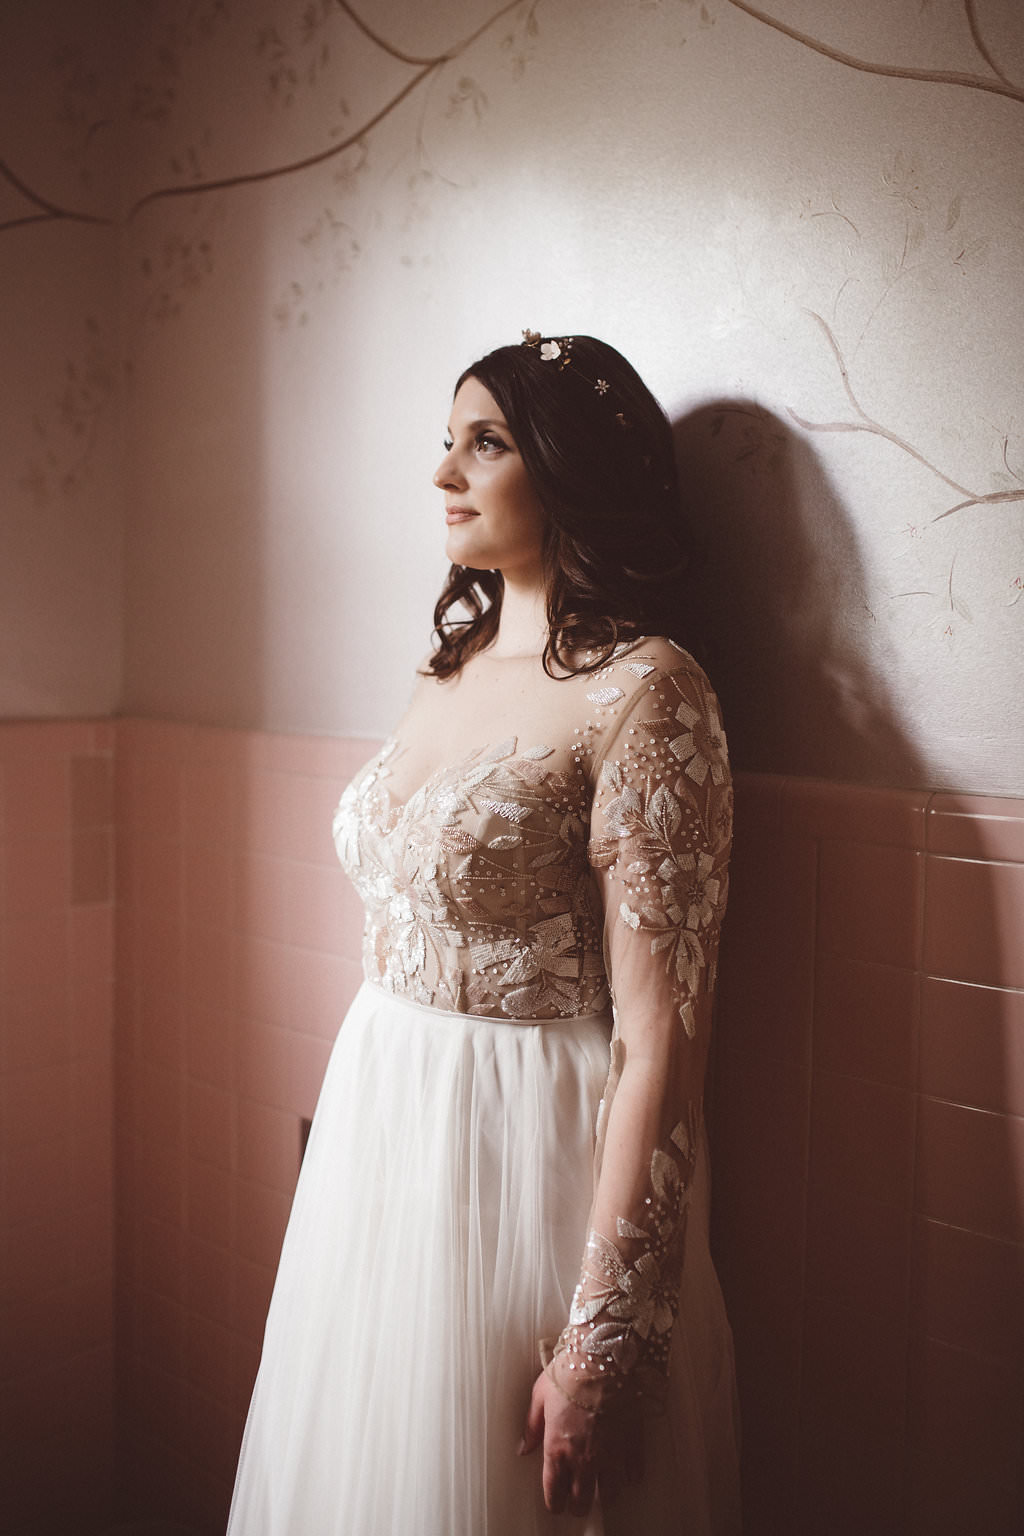 Bride Bridal Dress Gown Hayley Paige Long Sleeves Tulle Skirt Charleston Wedding Katherine Dalton Photography